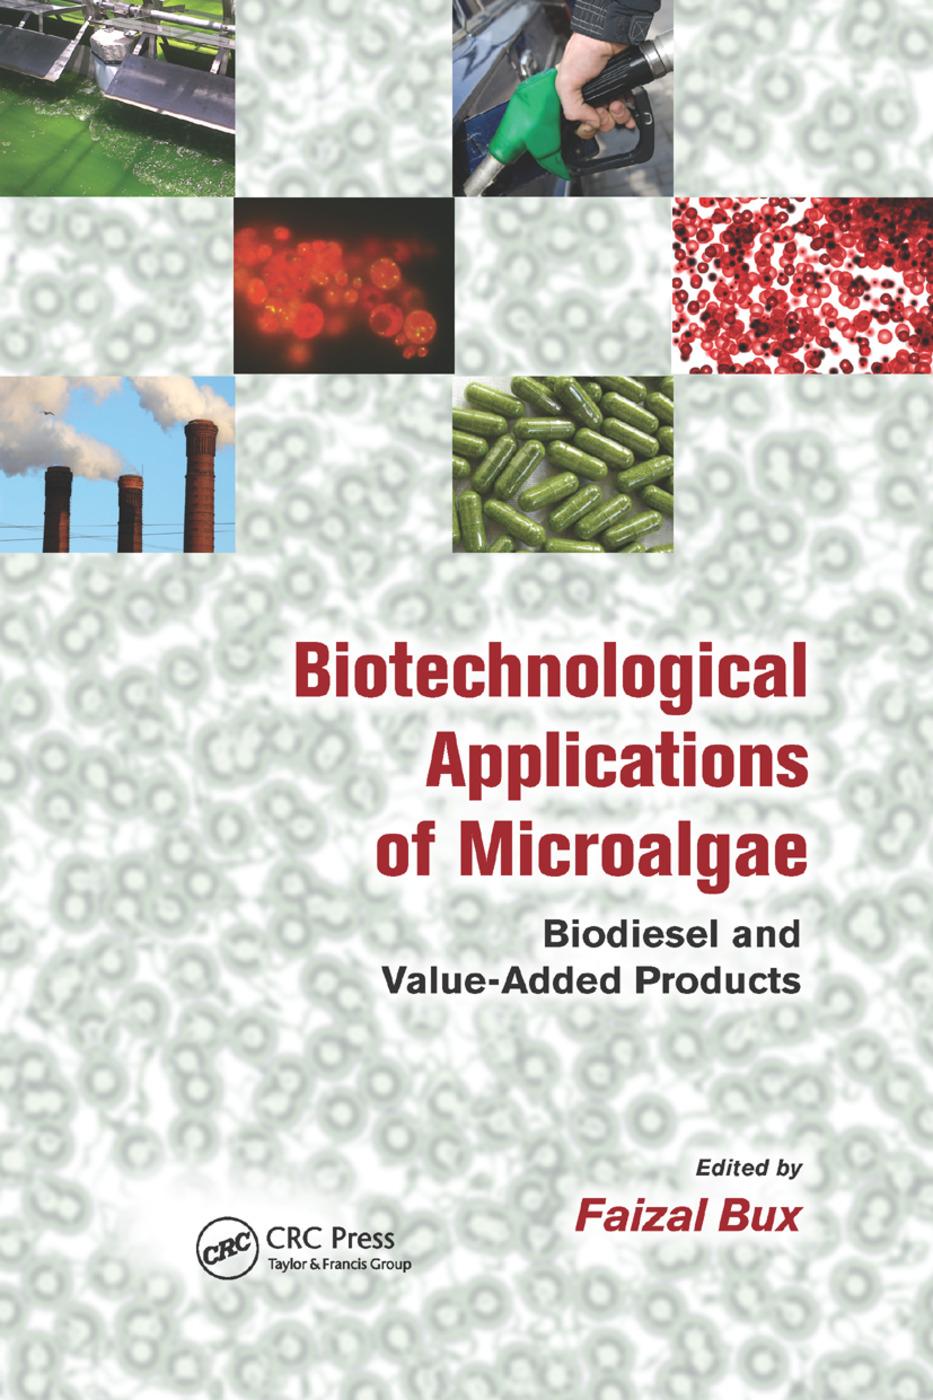 Biotechnological Applications of Microalgae